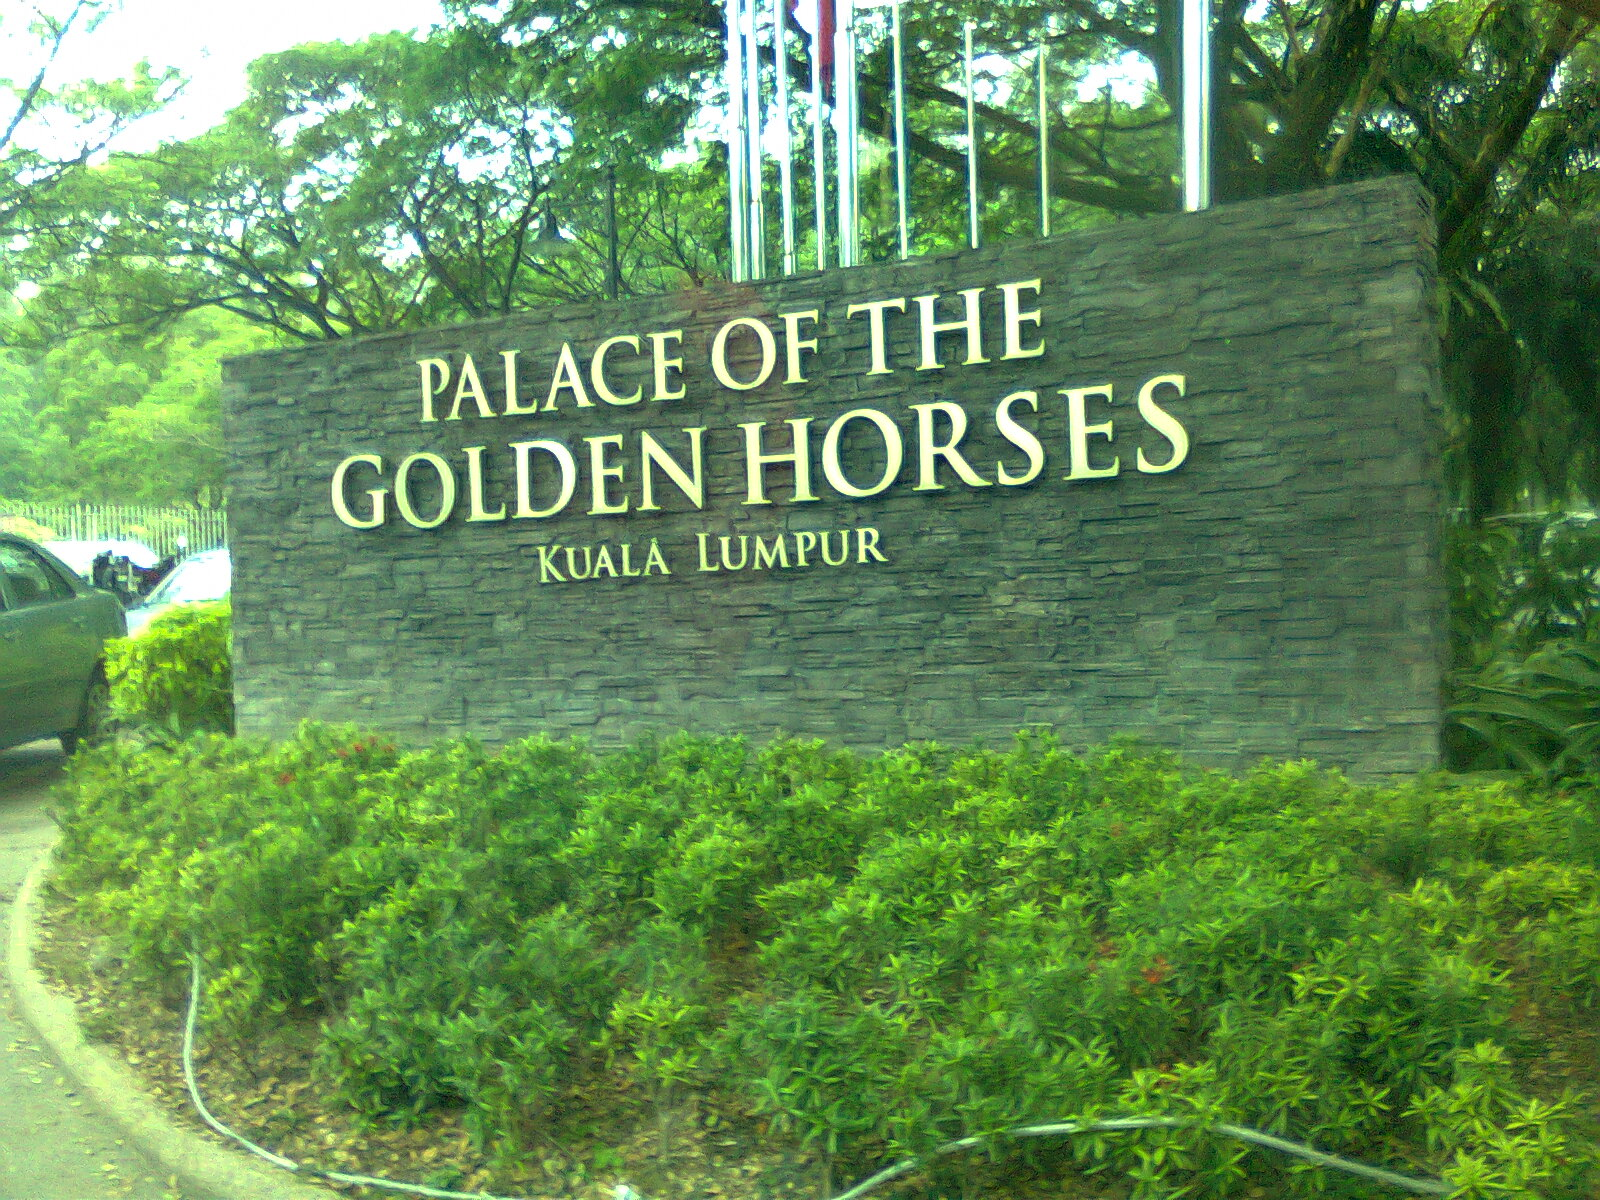 Zeihan ramli weekend palace of golden horses - Palace of the golden horses swimming pool ...